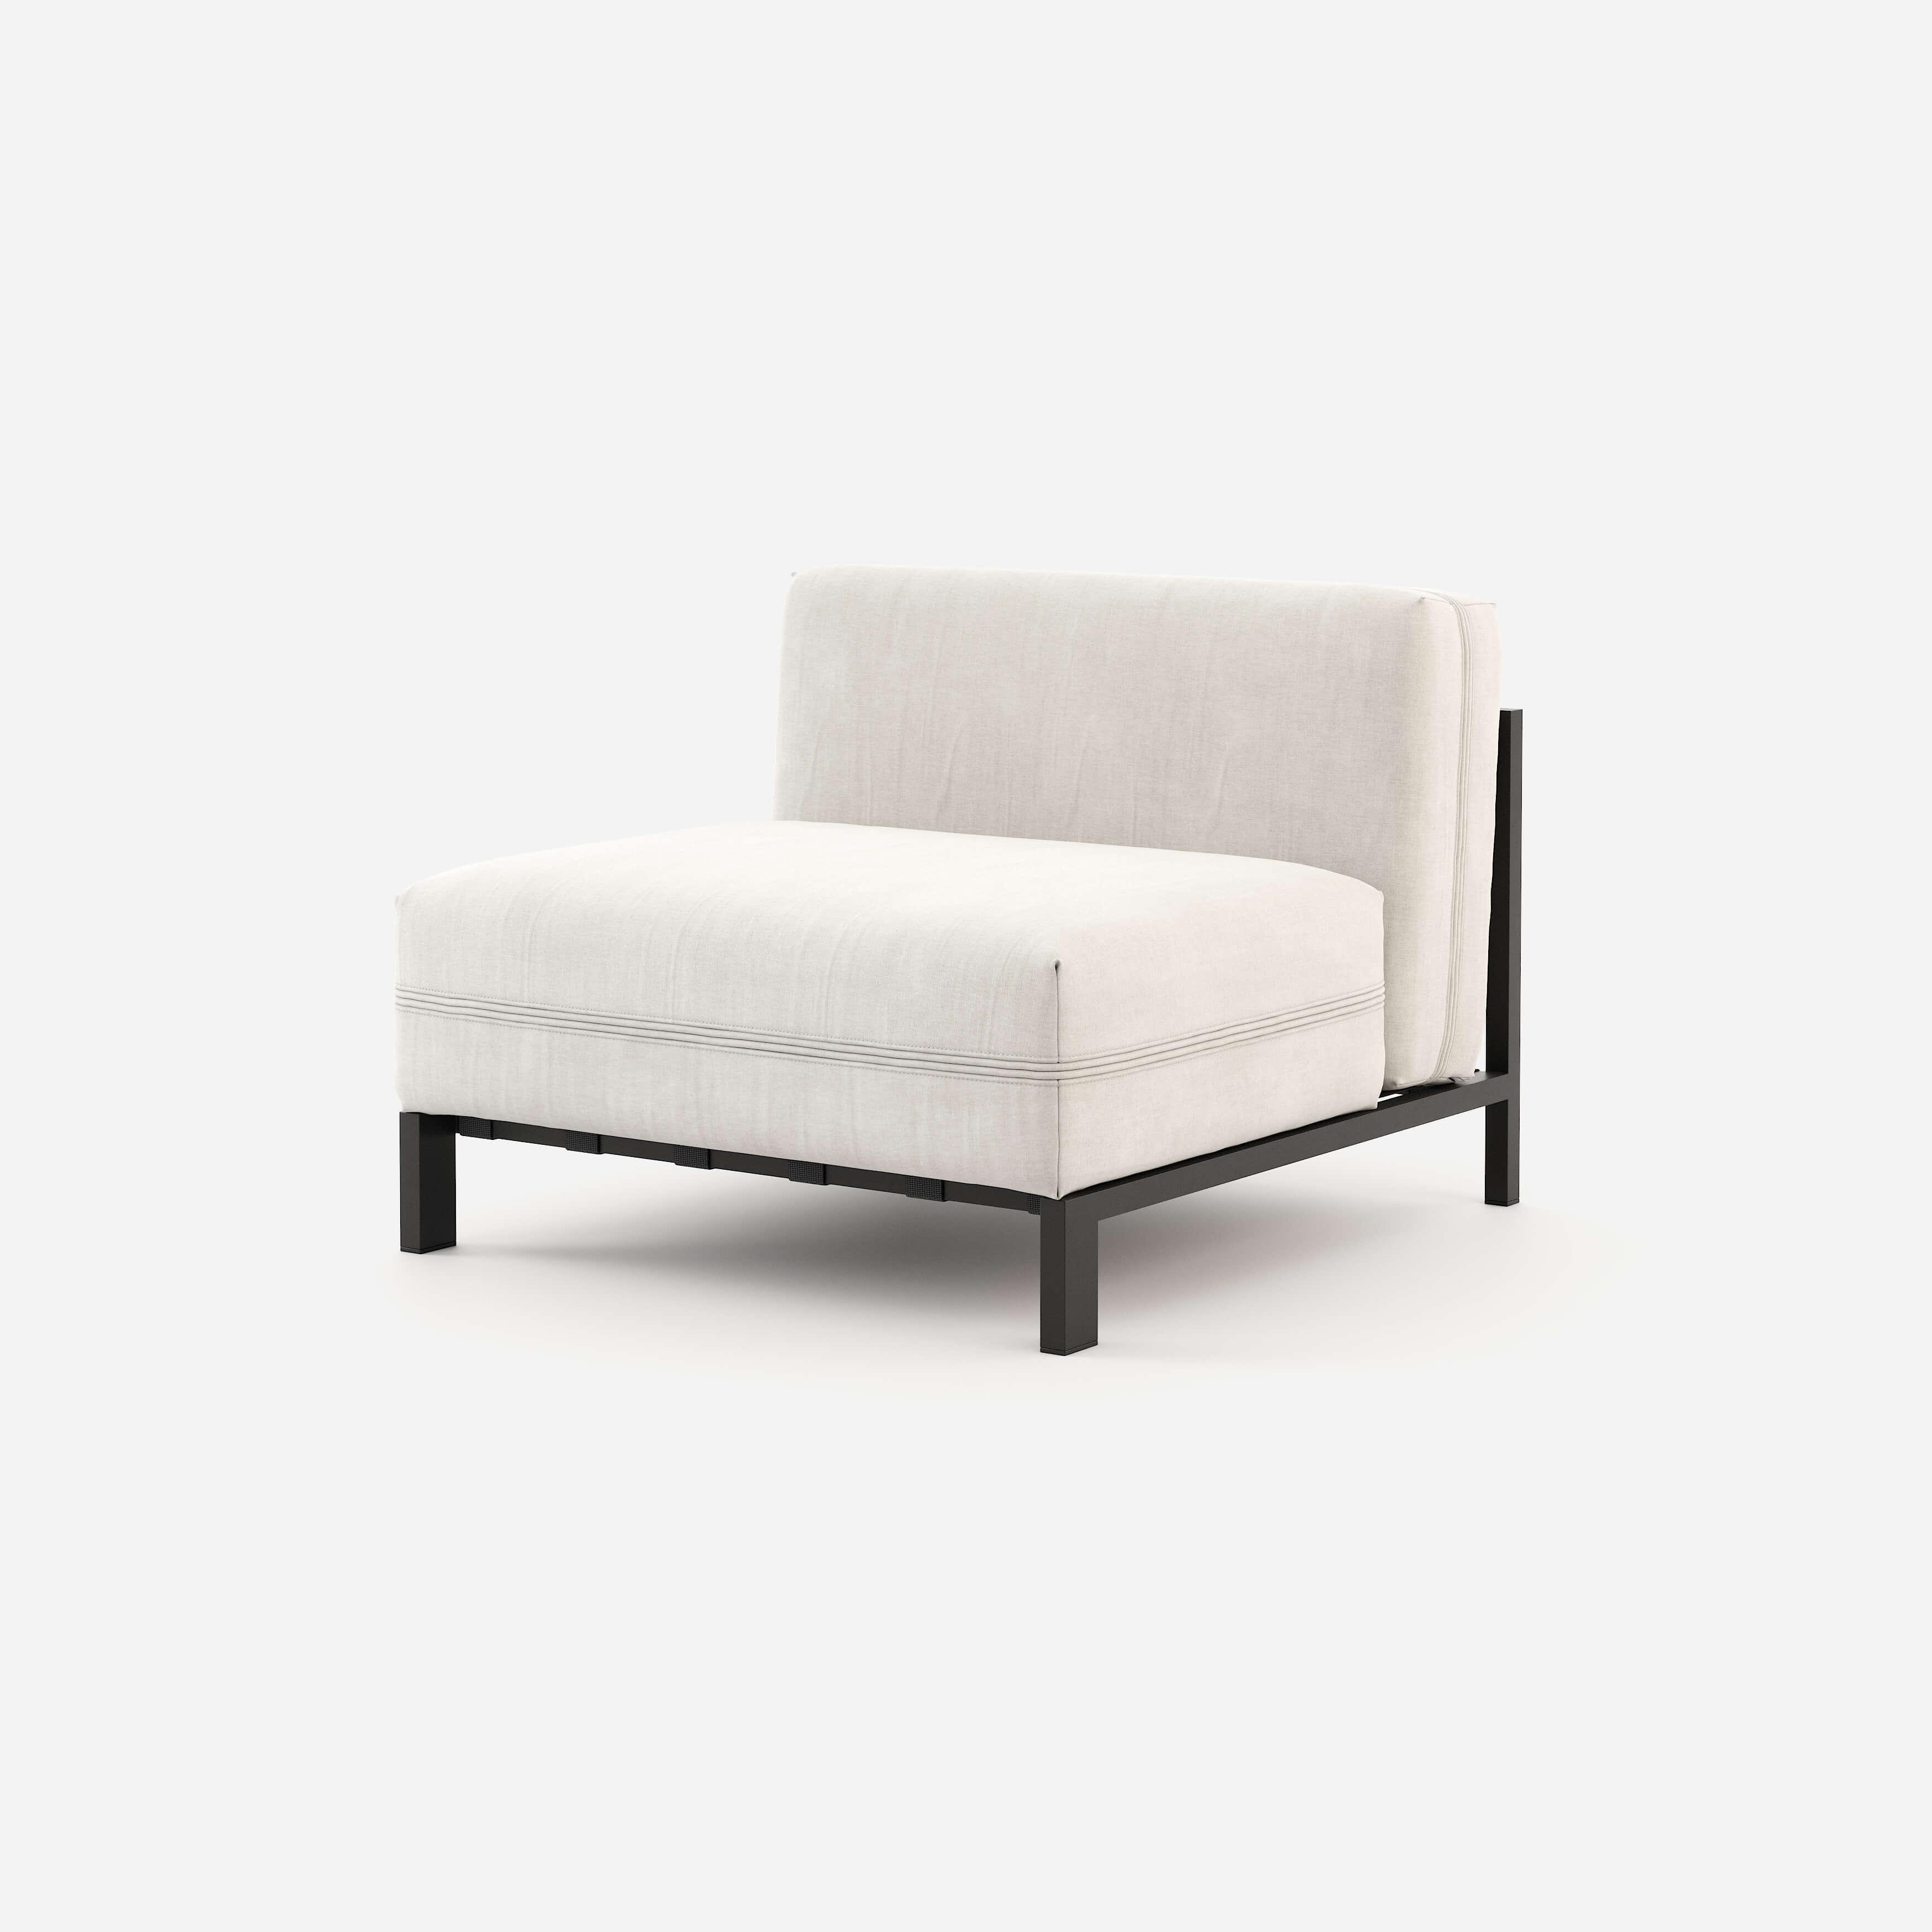 Bondi Middle Sofa-interior-design-home-decor-furniture-white-domkapa-upholstery-1